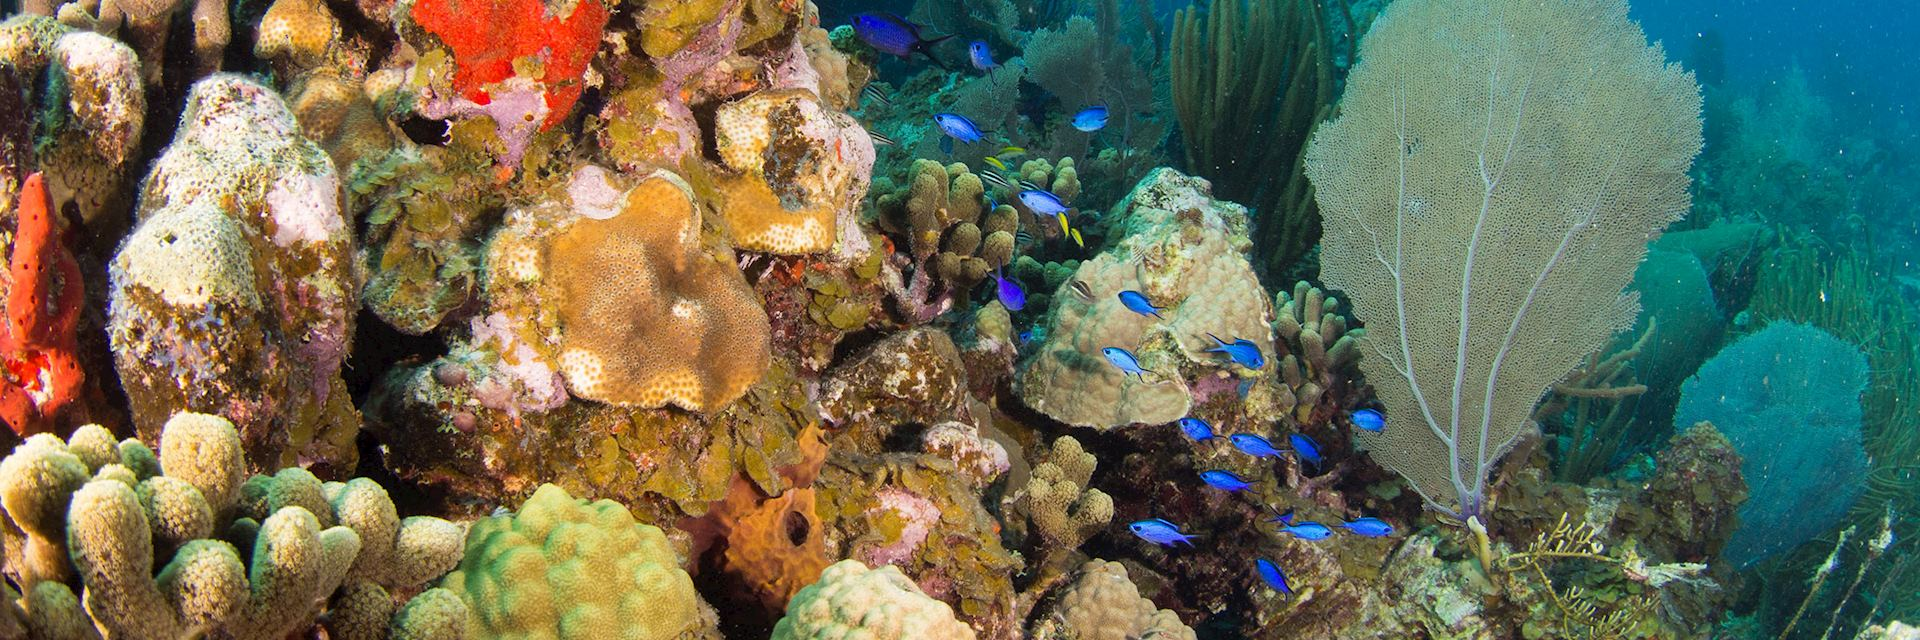 Coral reef in the British Virgin Islands